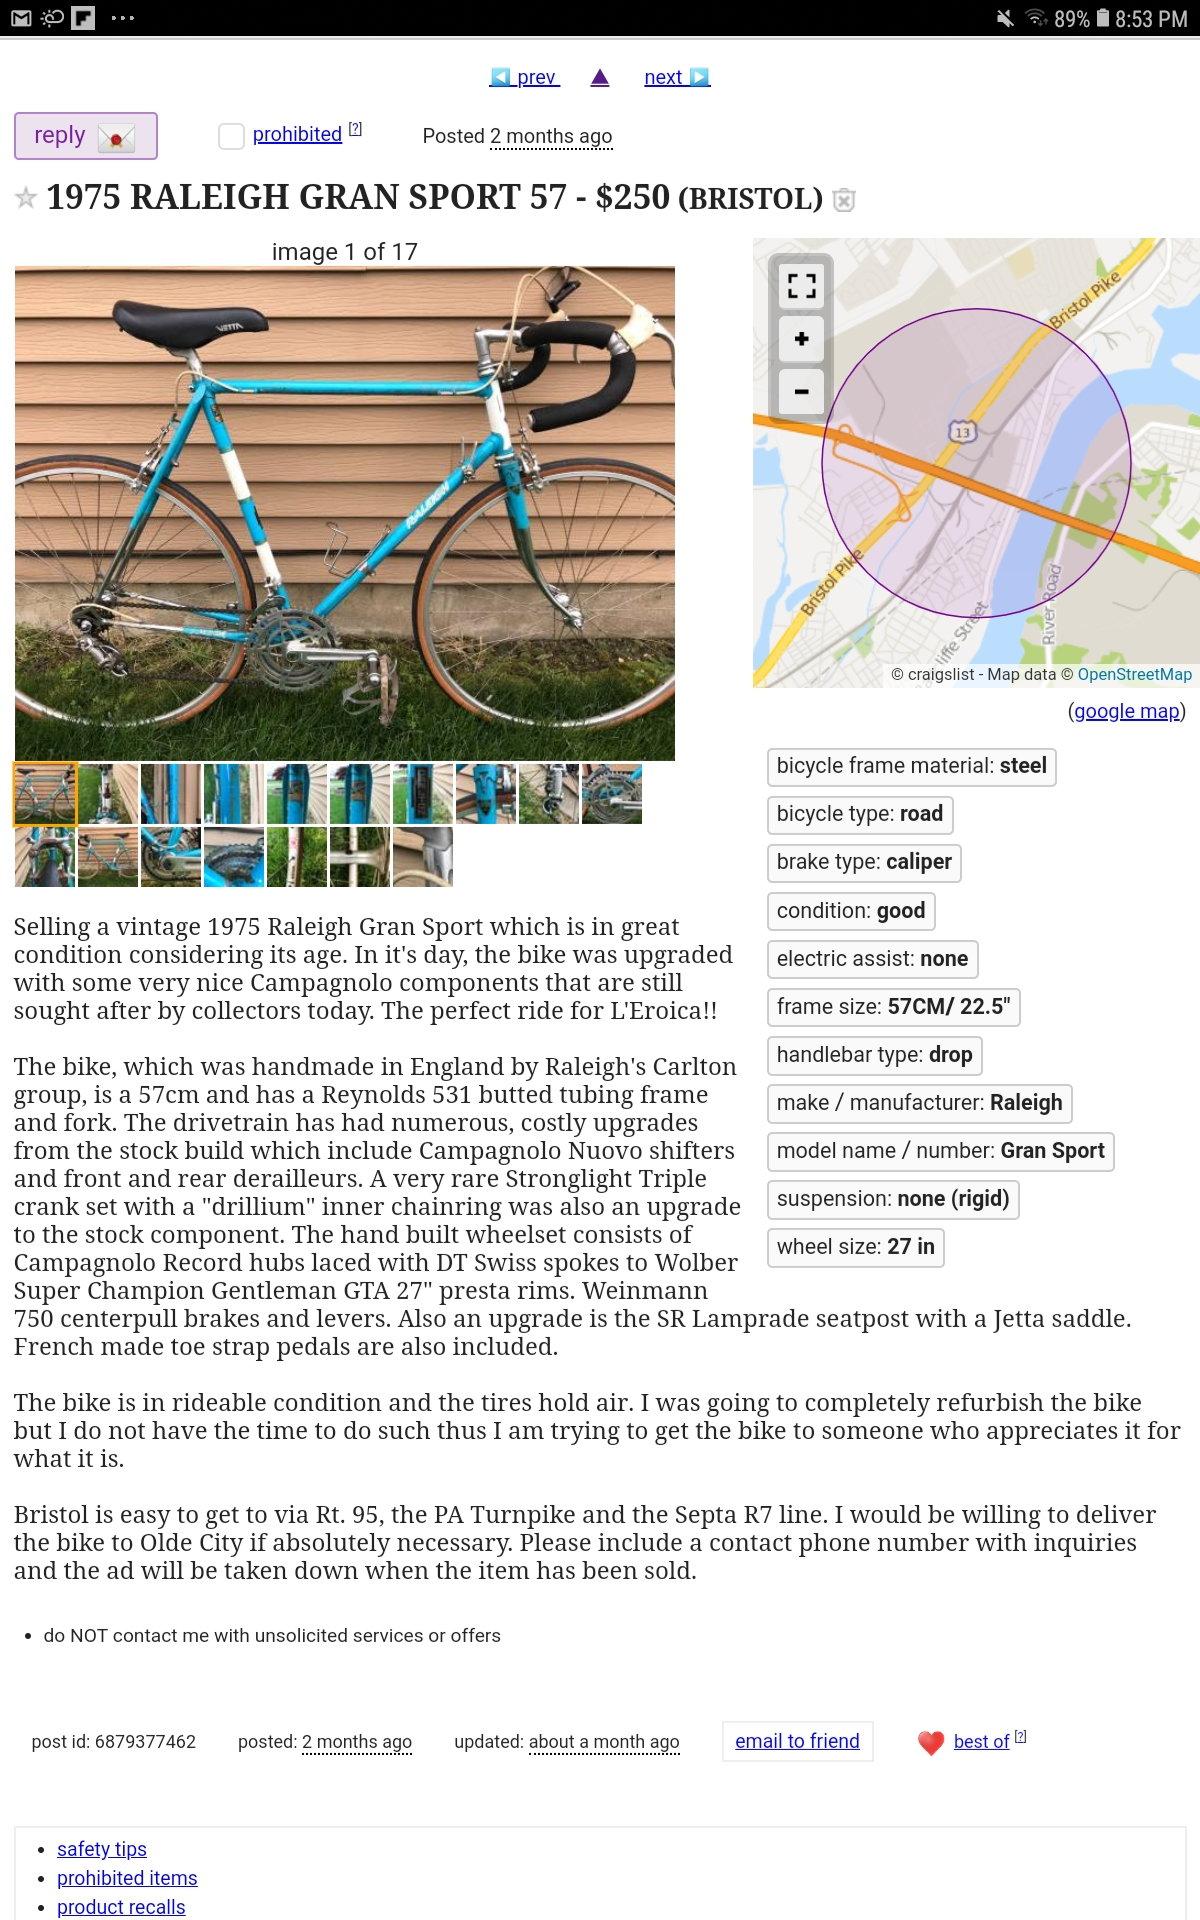 eBay / CraigsList finds -